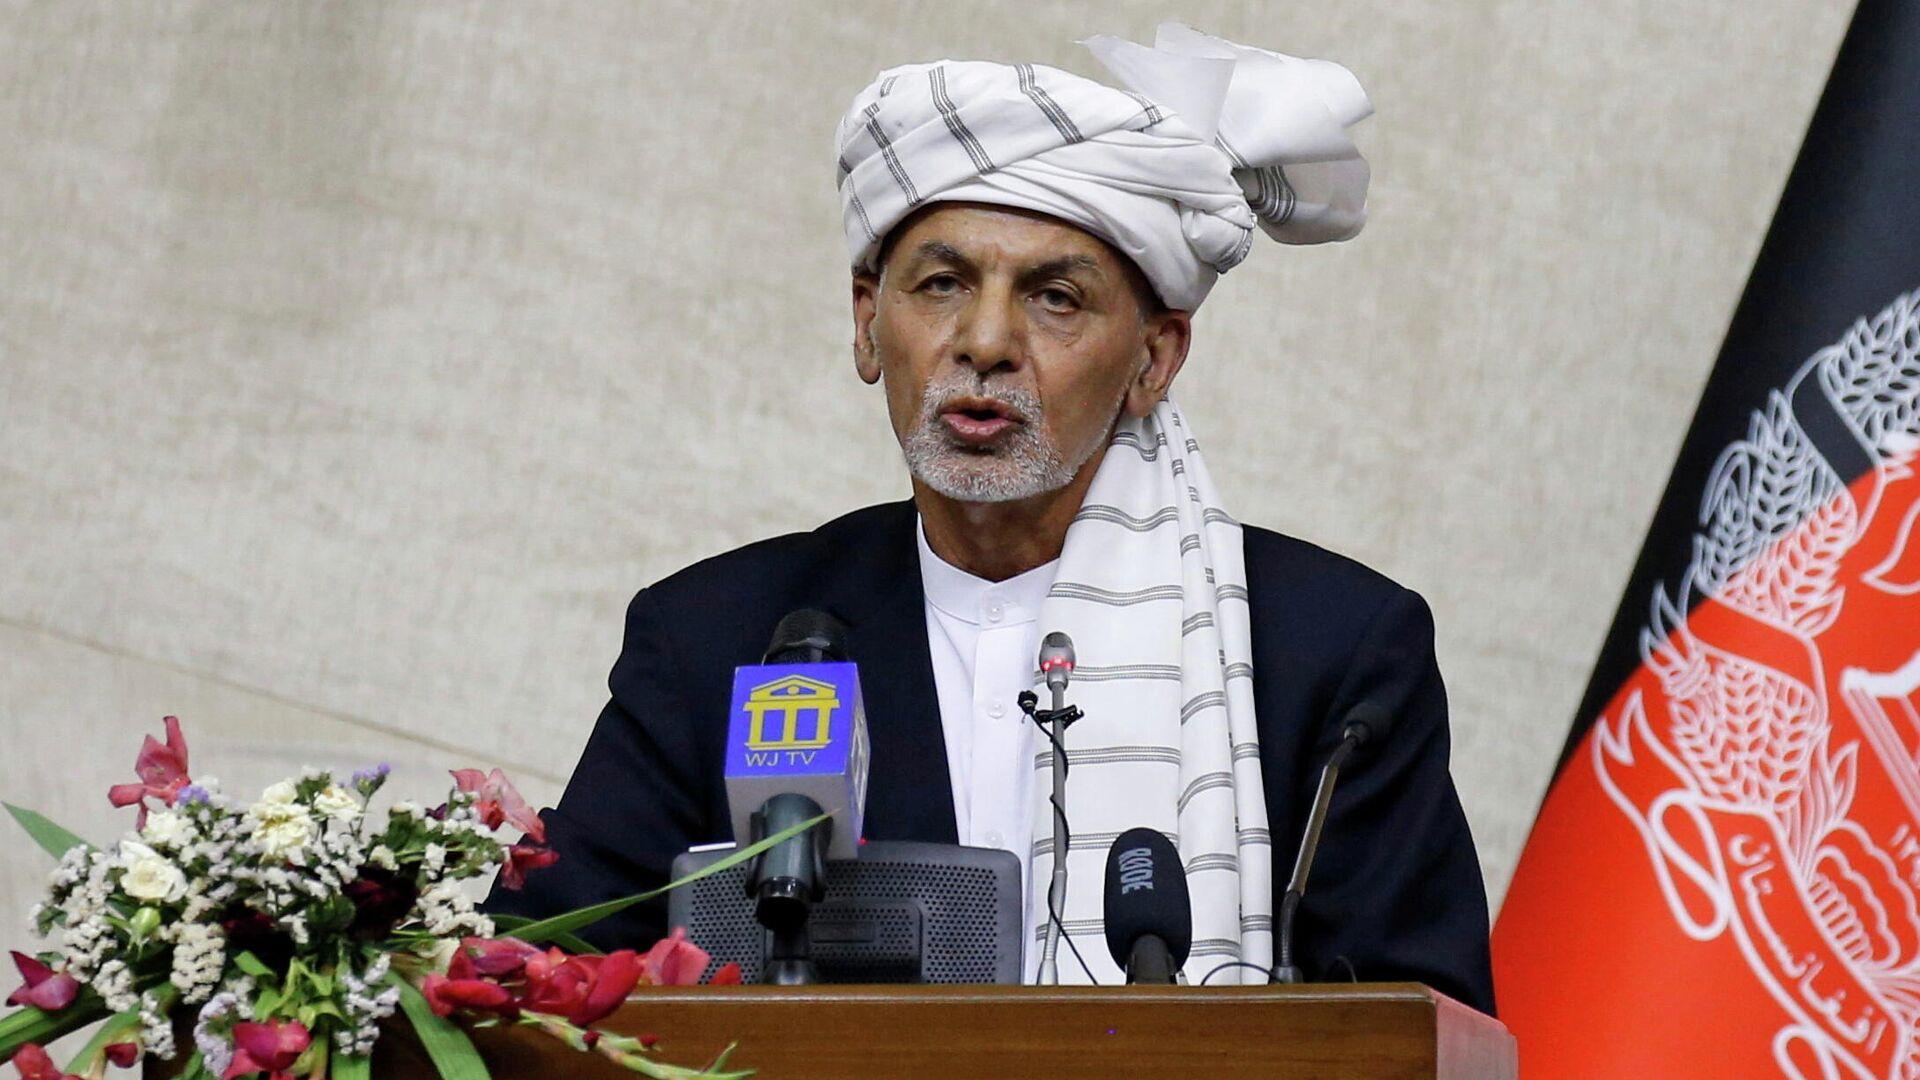 El expresidente afgano Ashraf Ghani - Sputnik Mundo, 1920, 18.08.2021